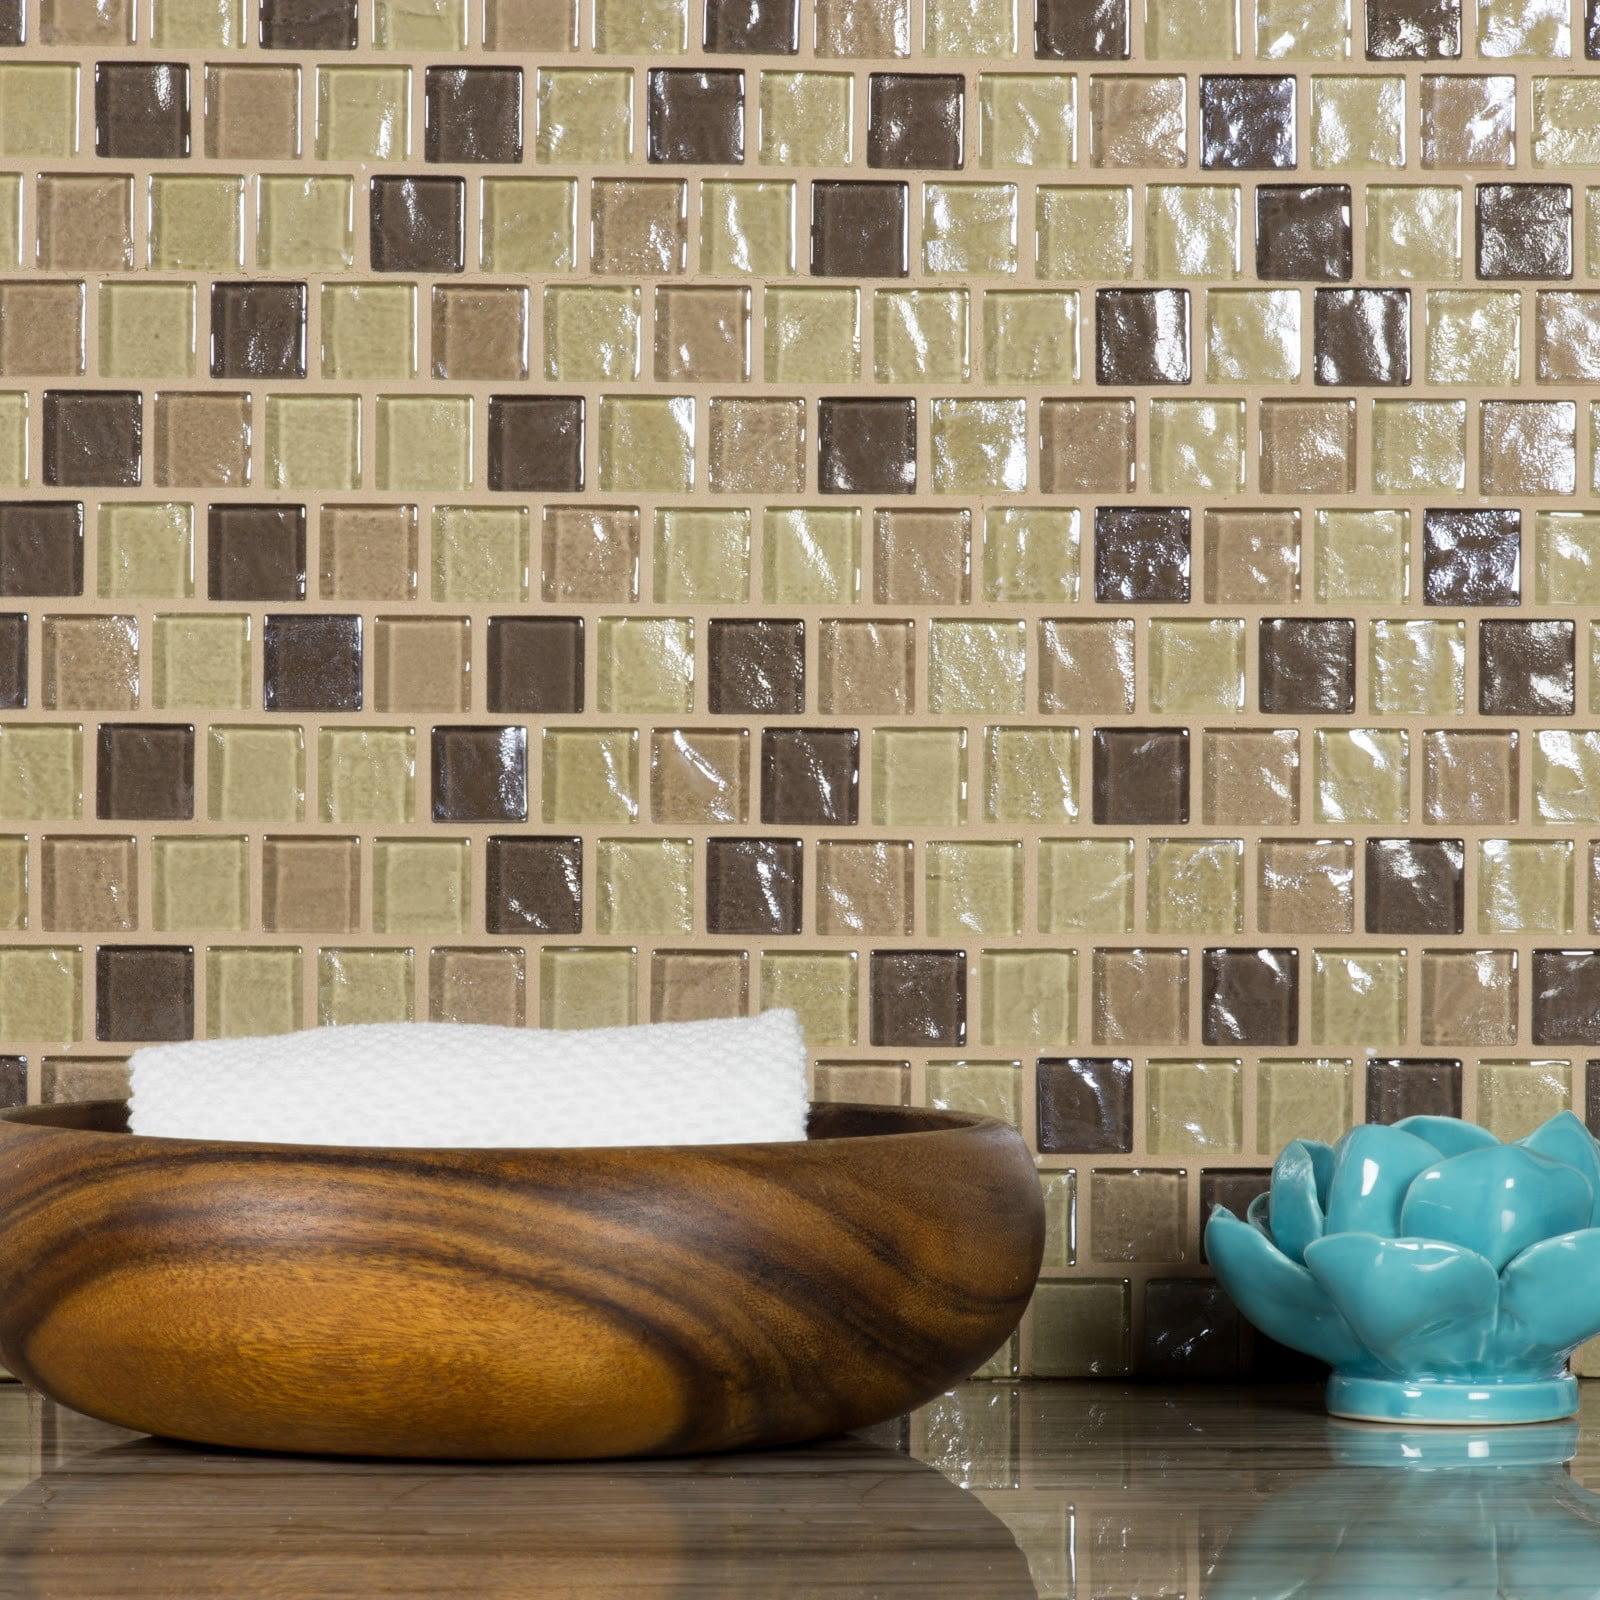 "Abolos- Geo 1"" x 1"" Glass Mosaic Backsplash Tile in Light Brown (4.9sqft / 5pc Box)"